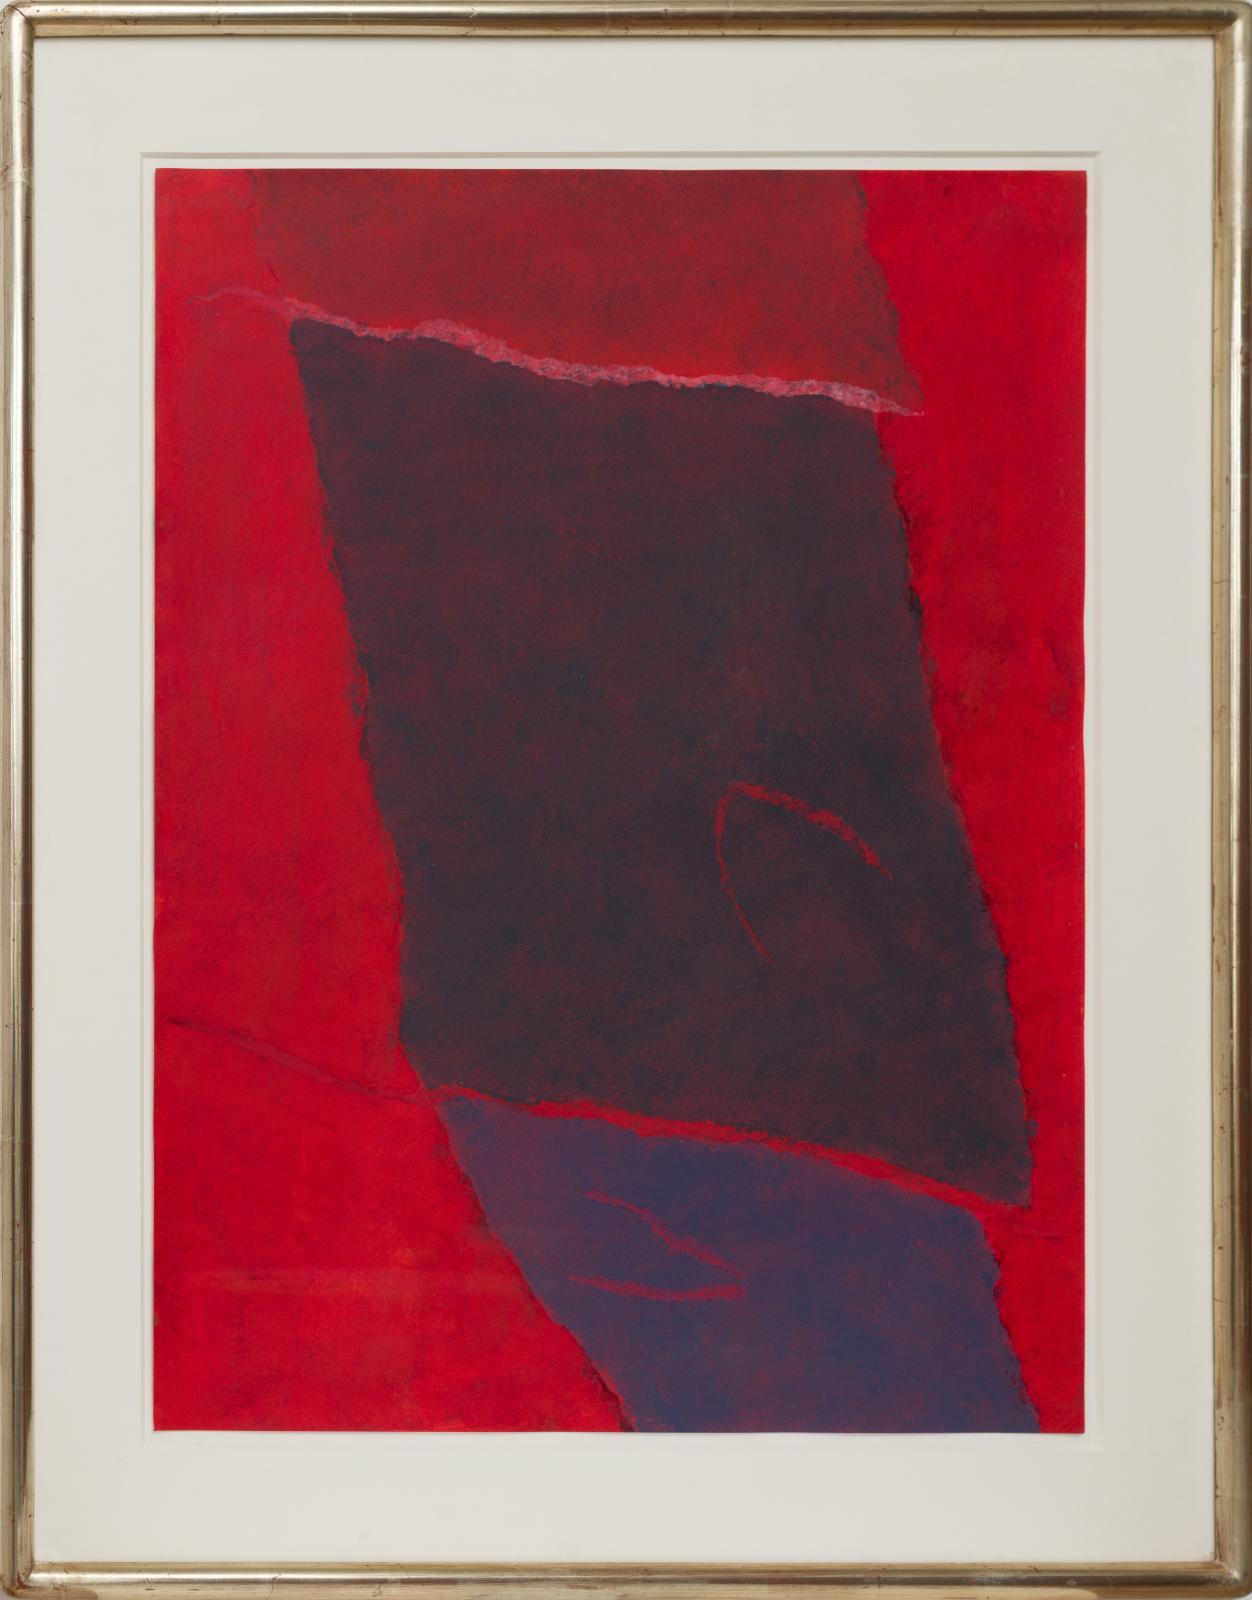 Infinity Field Lefkada Series, Red, 1978